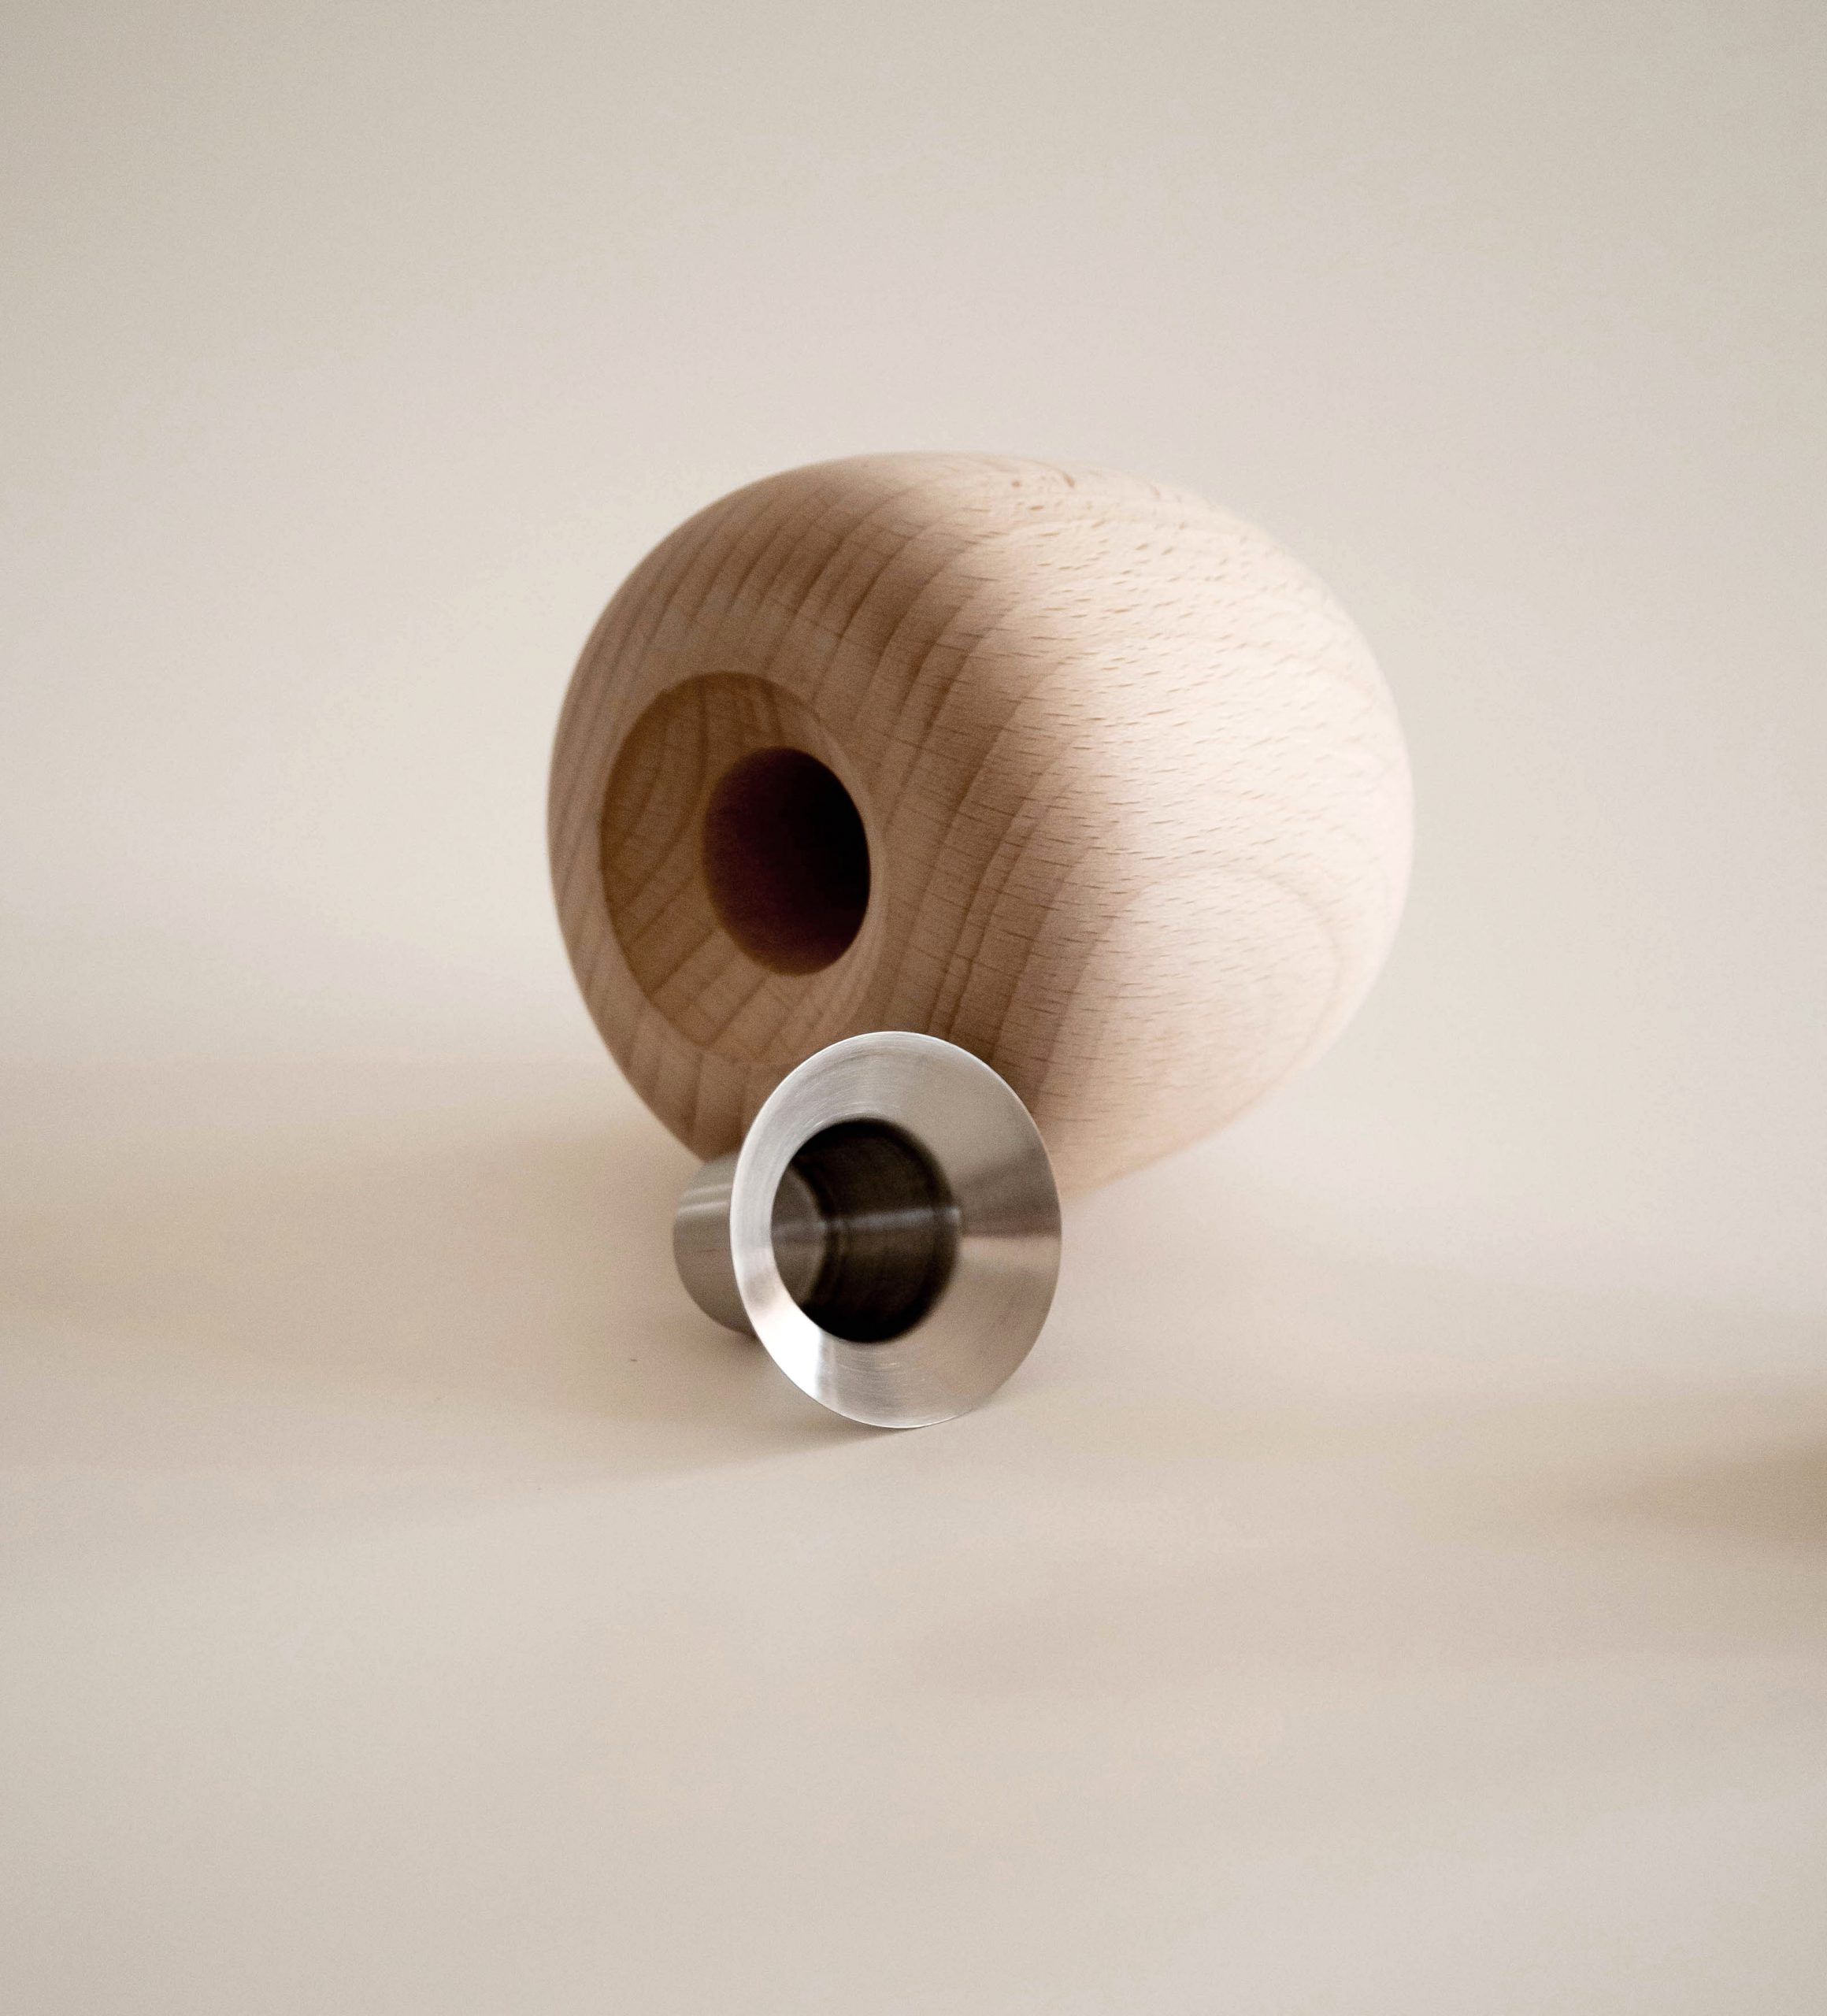 Ora candle holder wood detail by Debiasi Sandri for Stelton